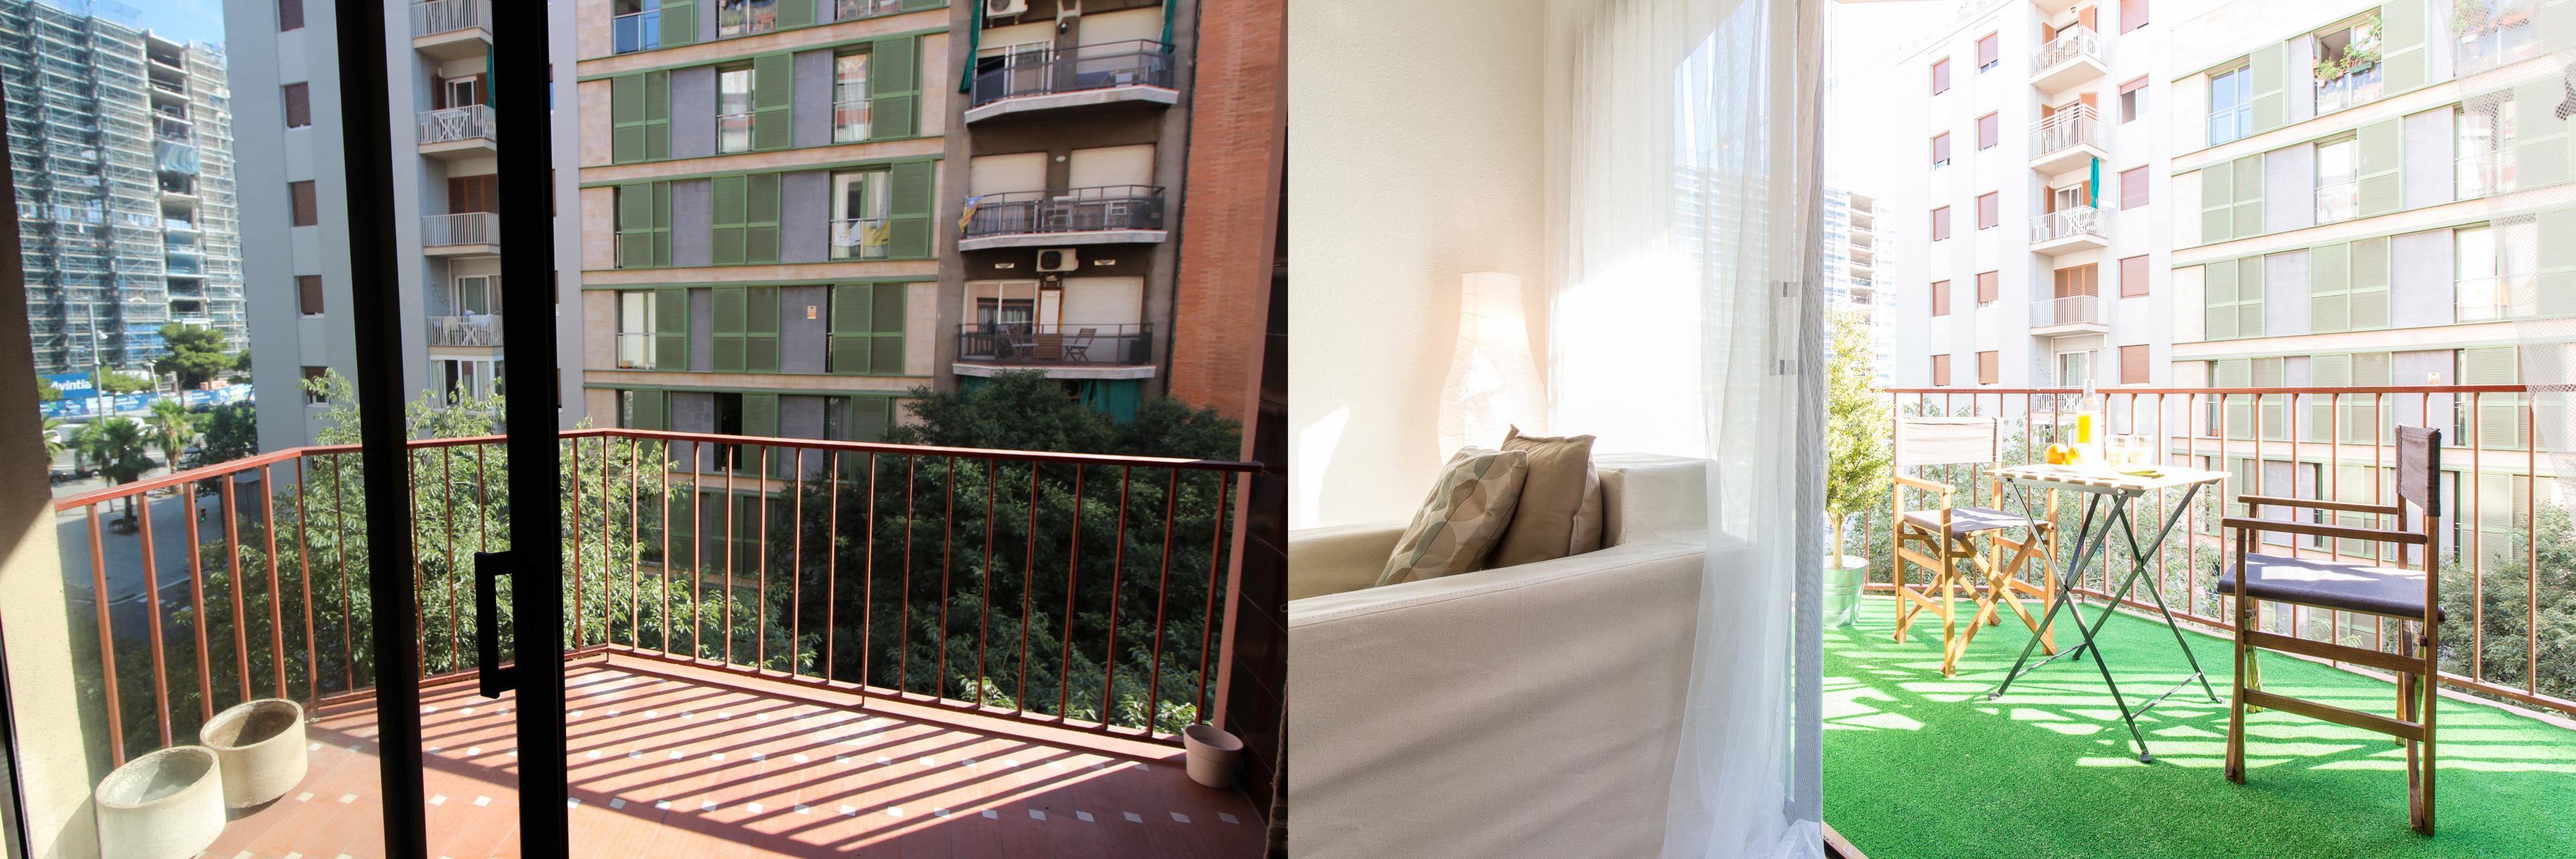 Home staging barcelona balcón